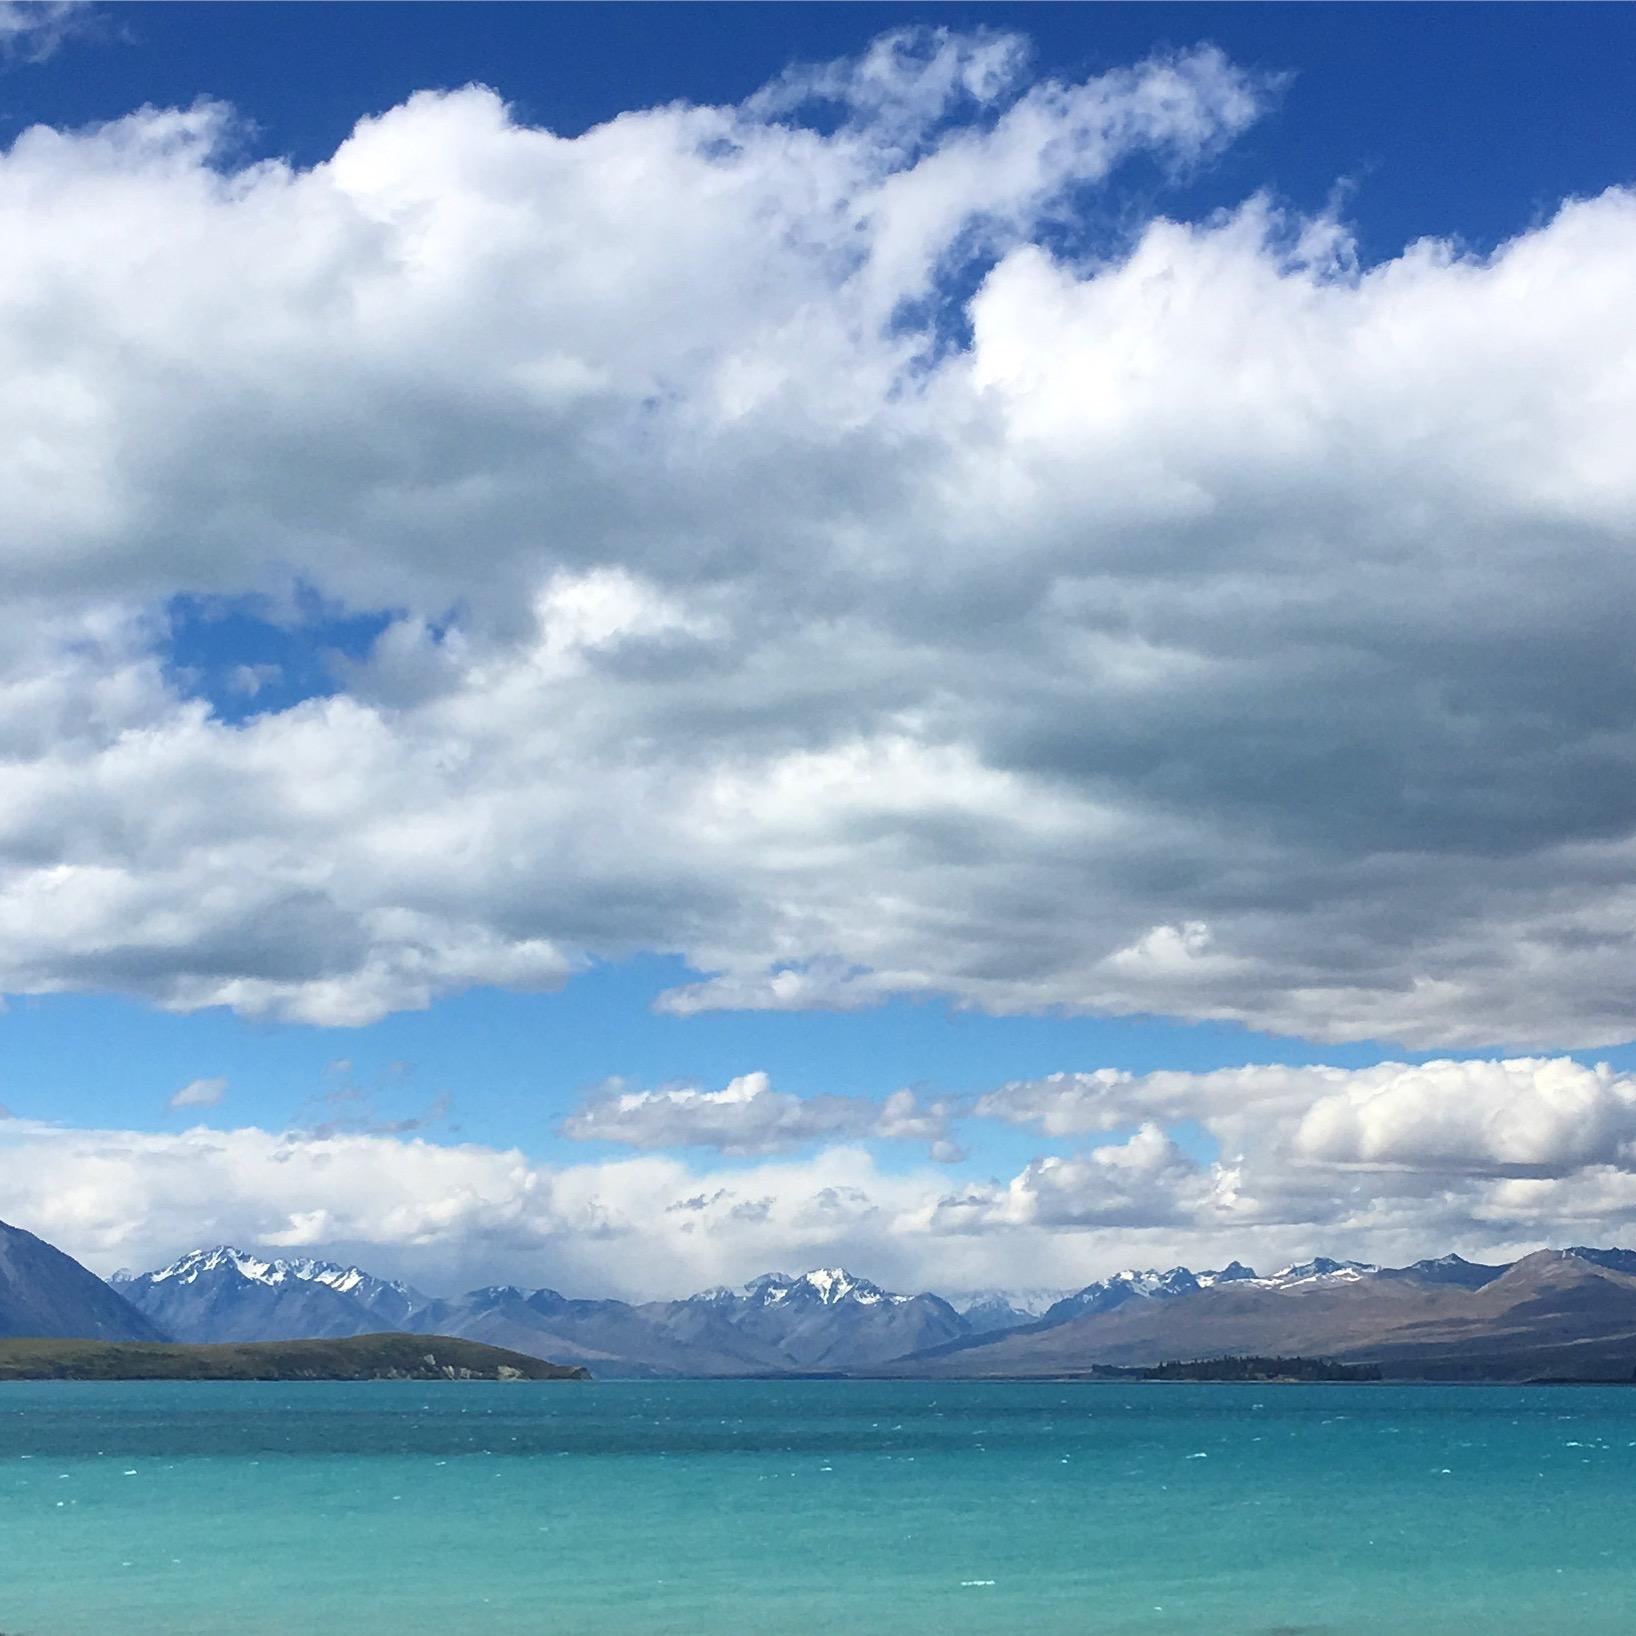 Lozidaze_NZ_Lake-Tekapo_04